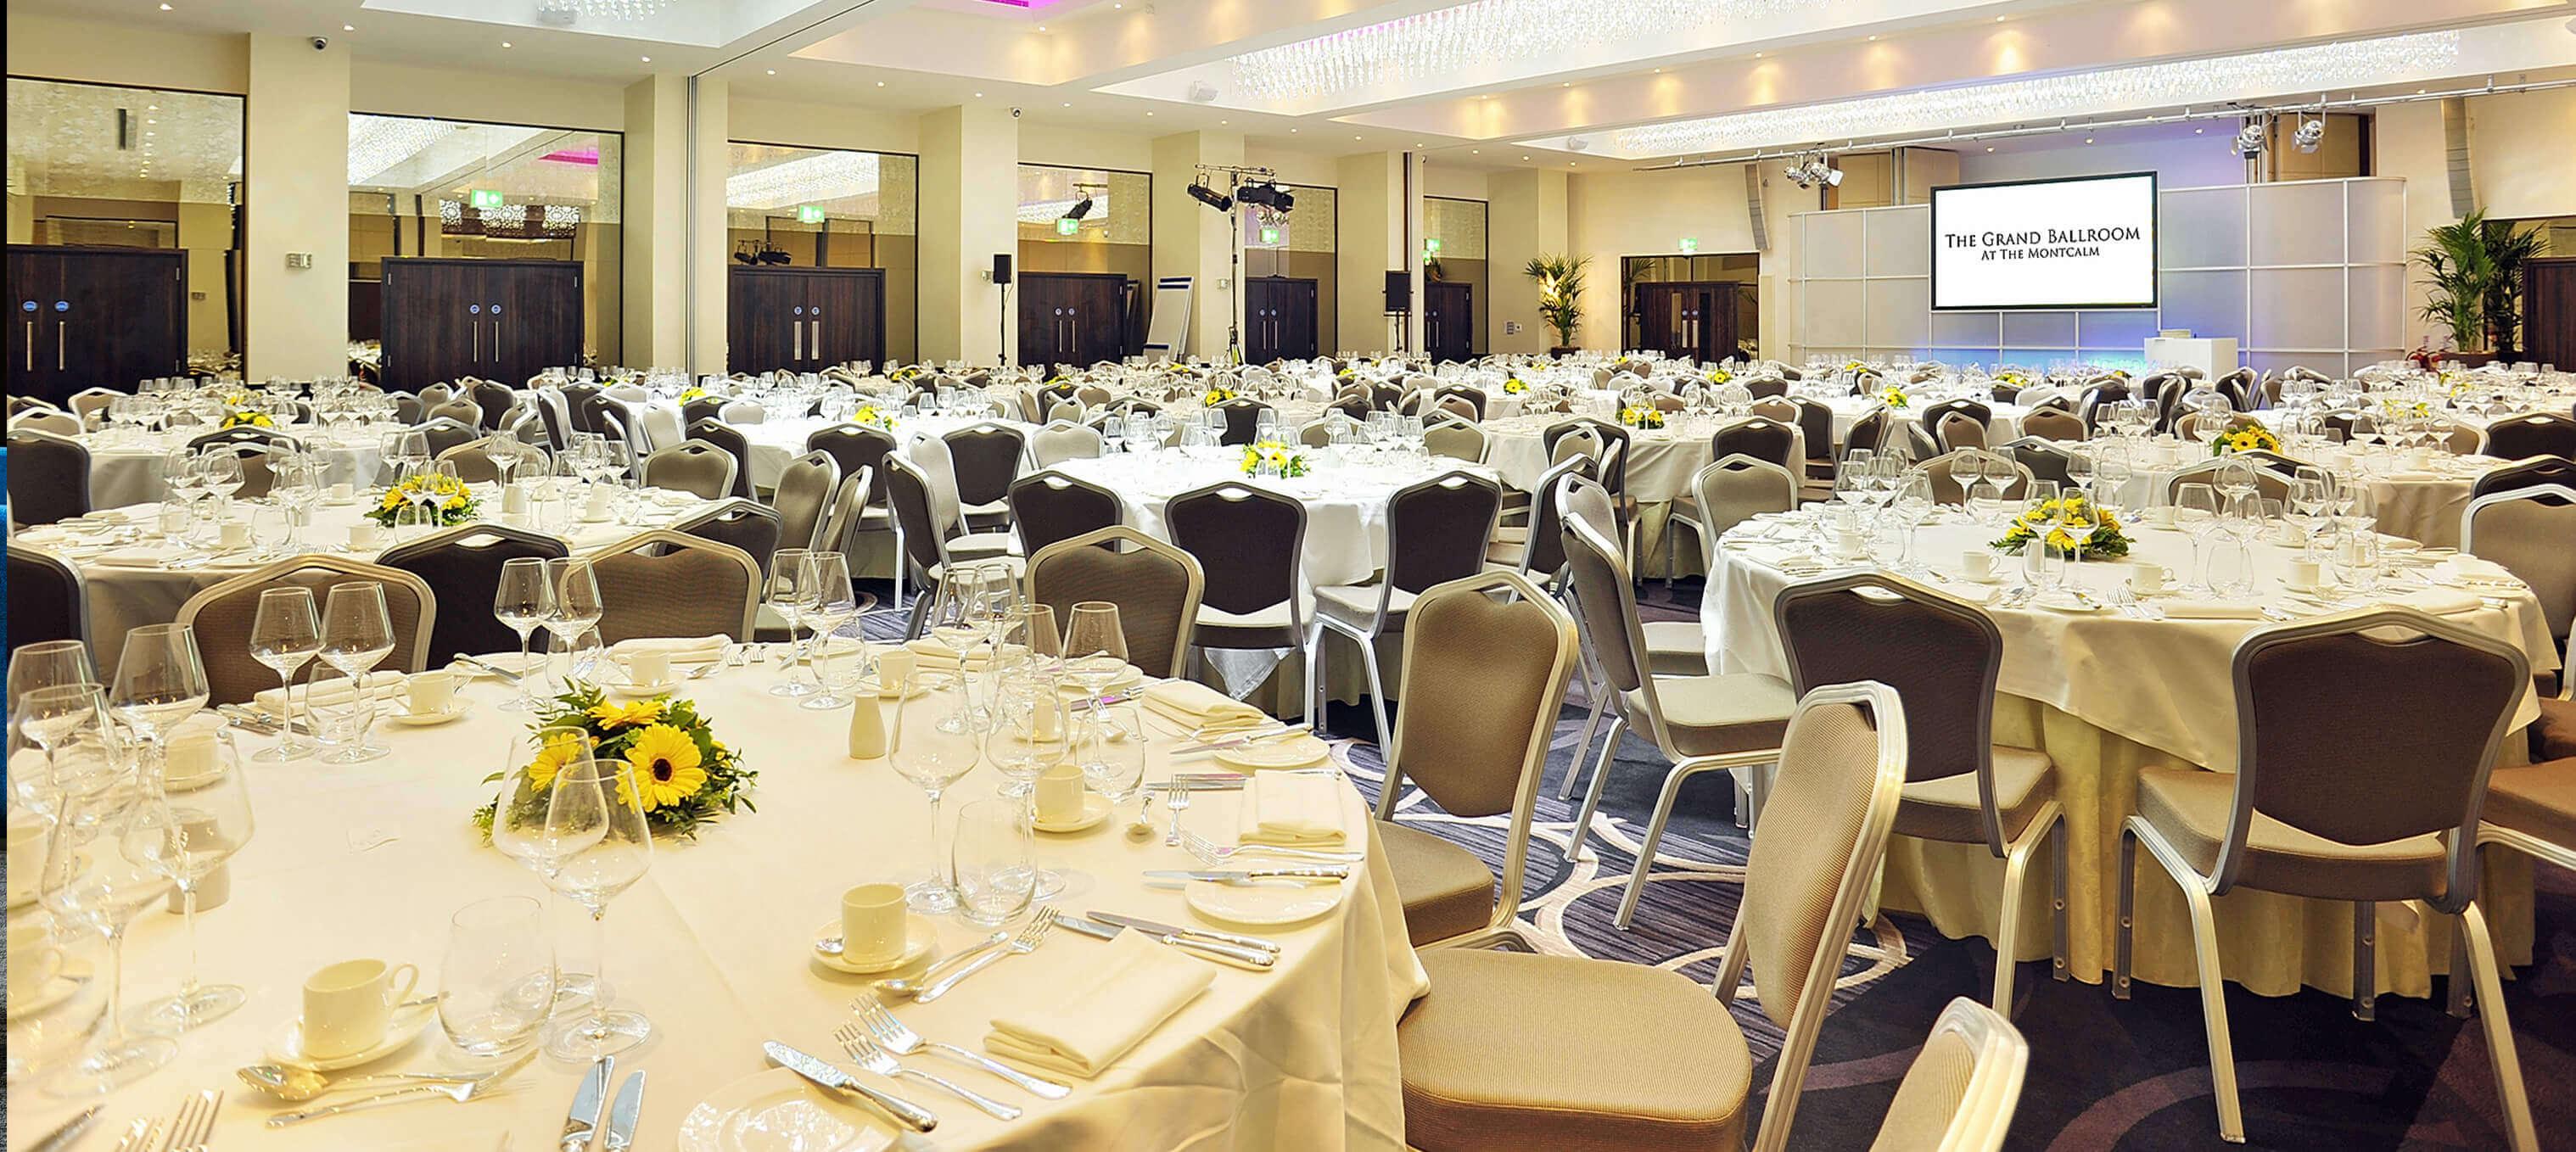 Como the Montcalm London the grand Ballroom 1012 High Adjusted